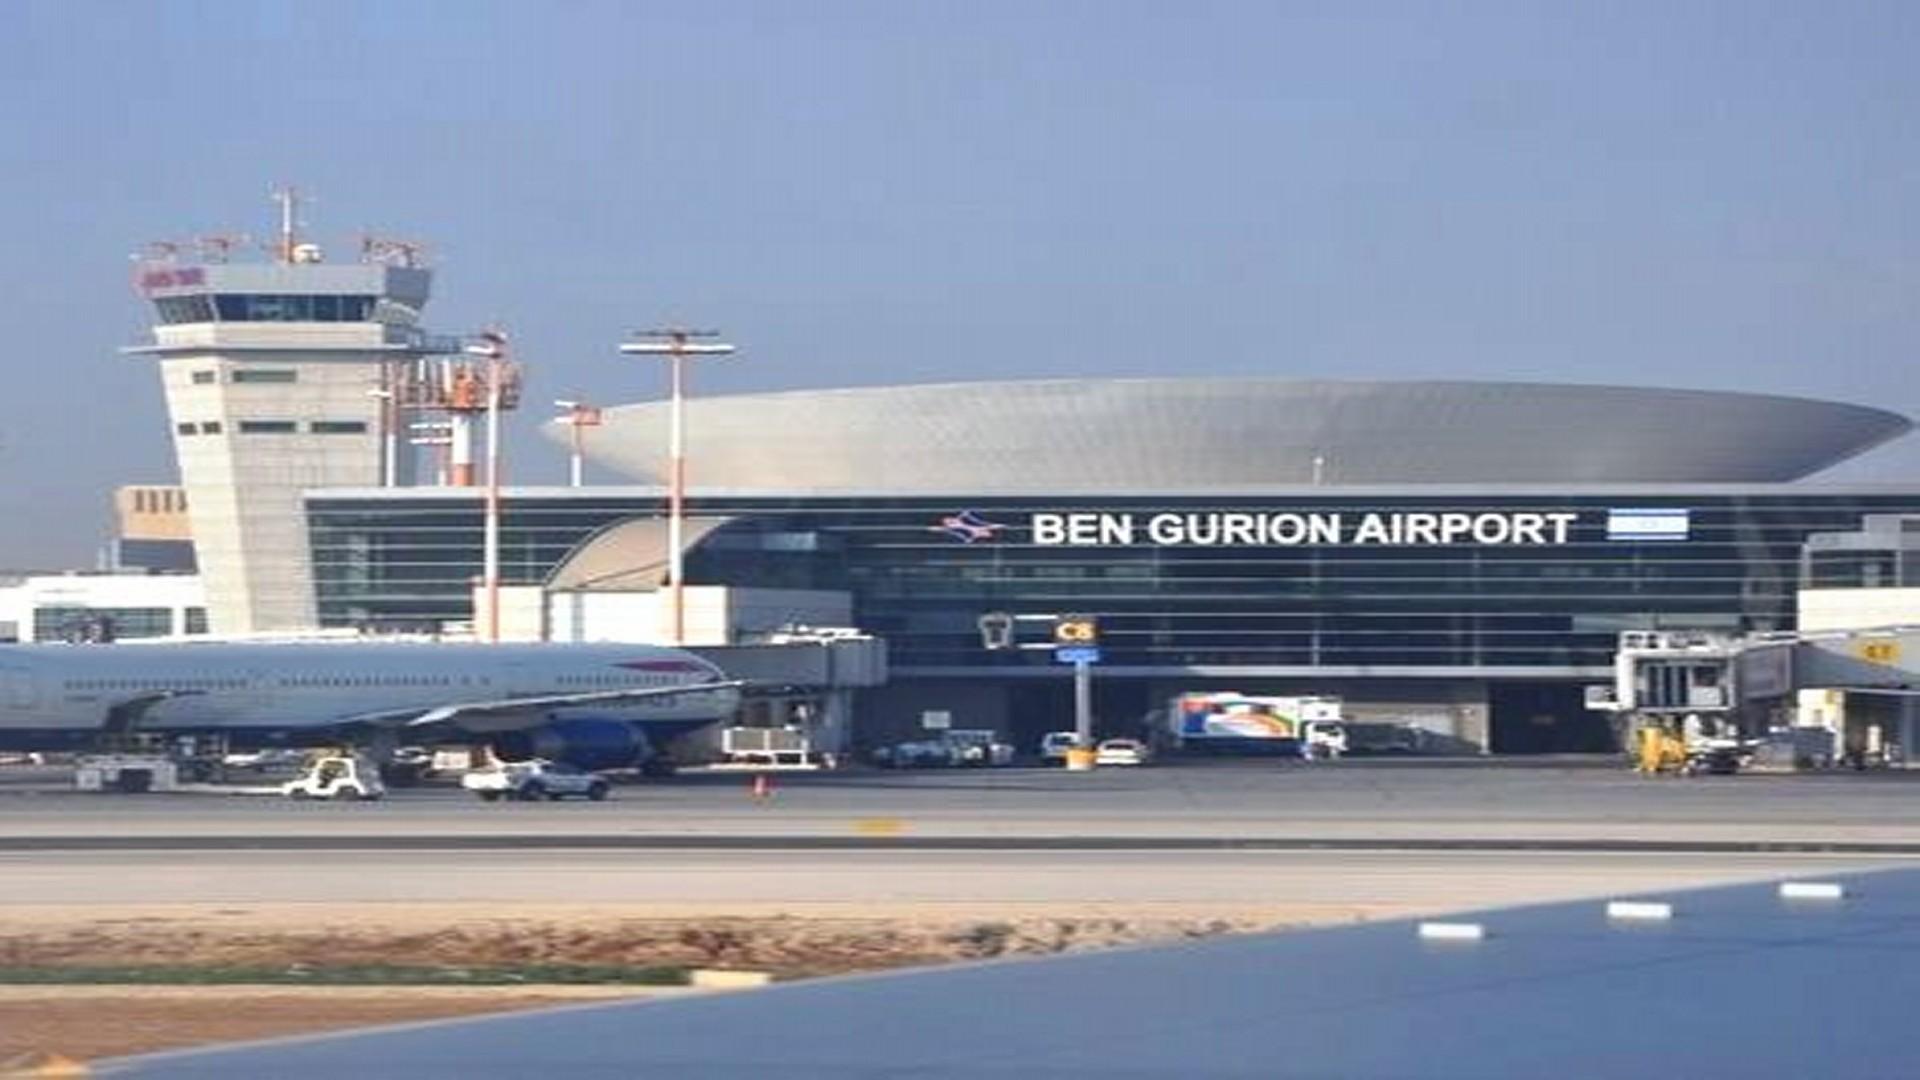 car rental ben gurion airport  Avoid The Long Ben Gurion Car Rental Lines | Yeshiva World News